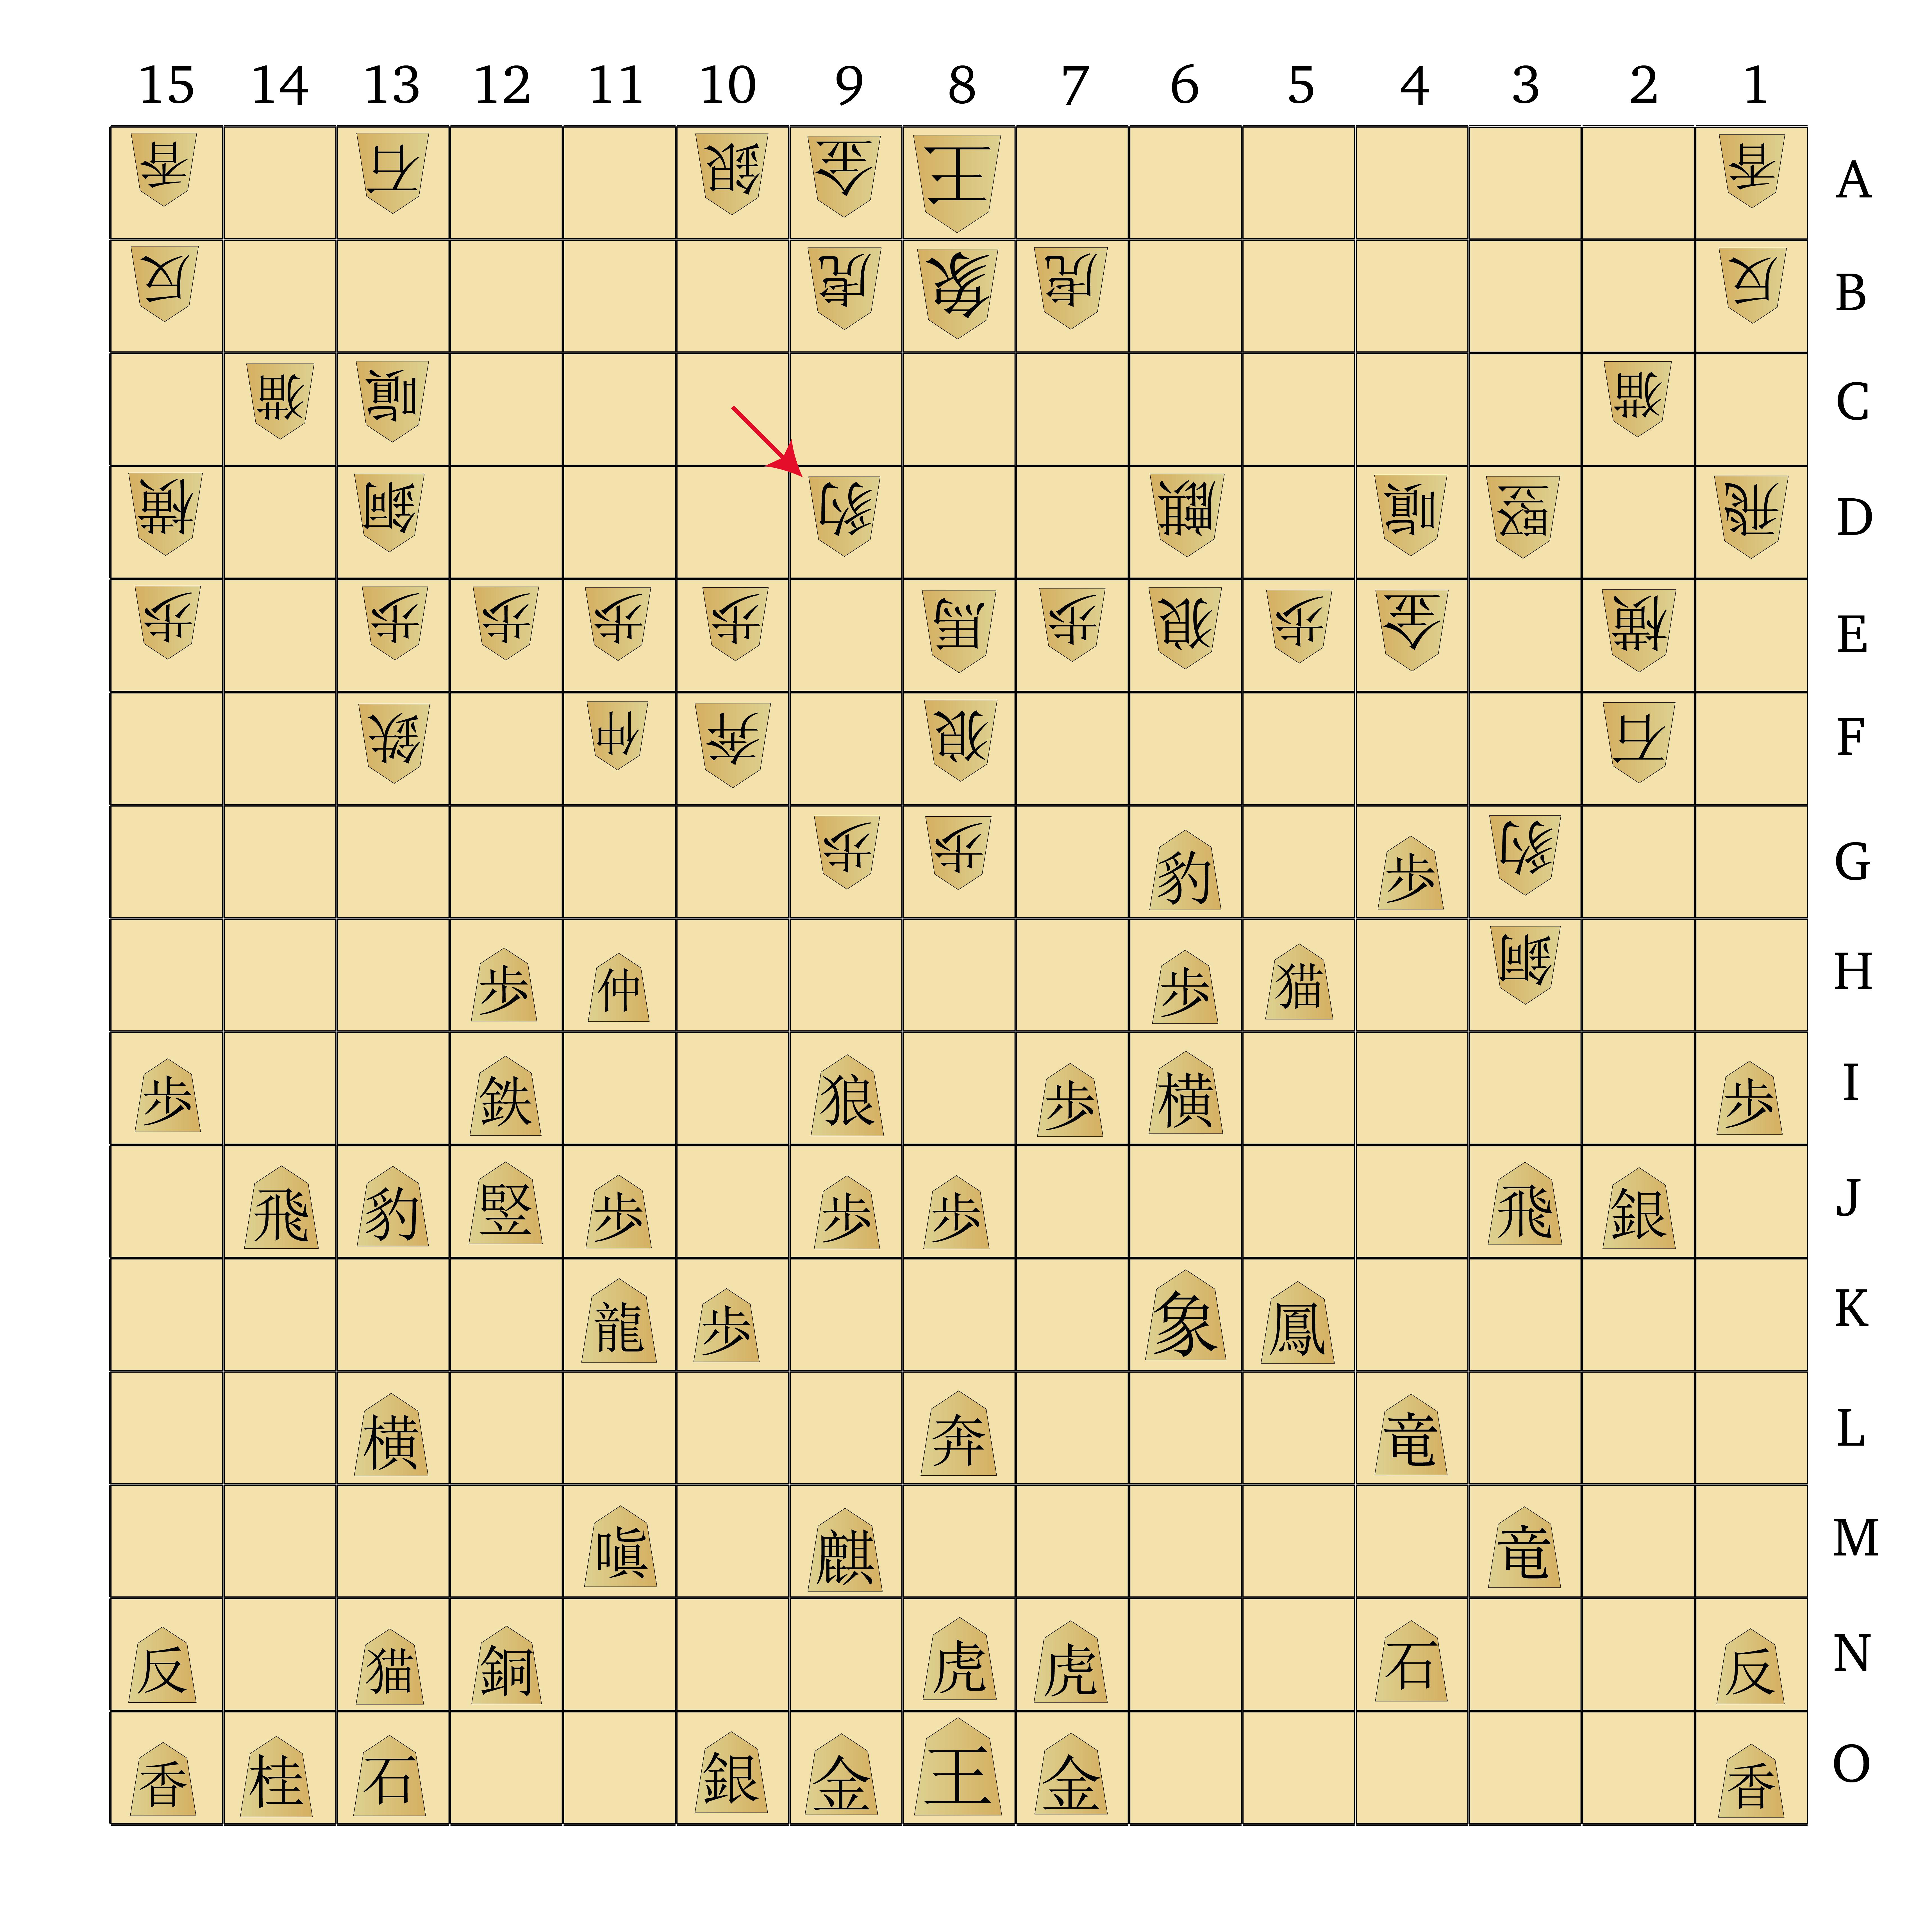 Dai Shogi 420 -- Move 300-01